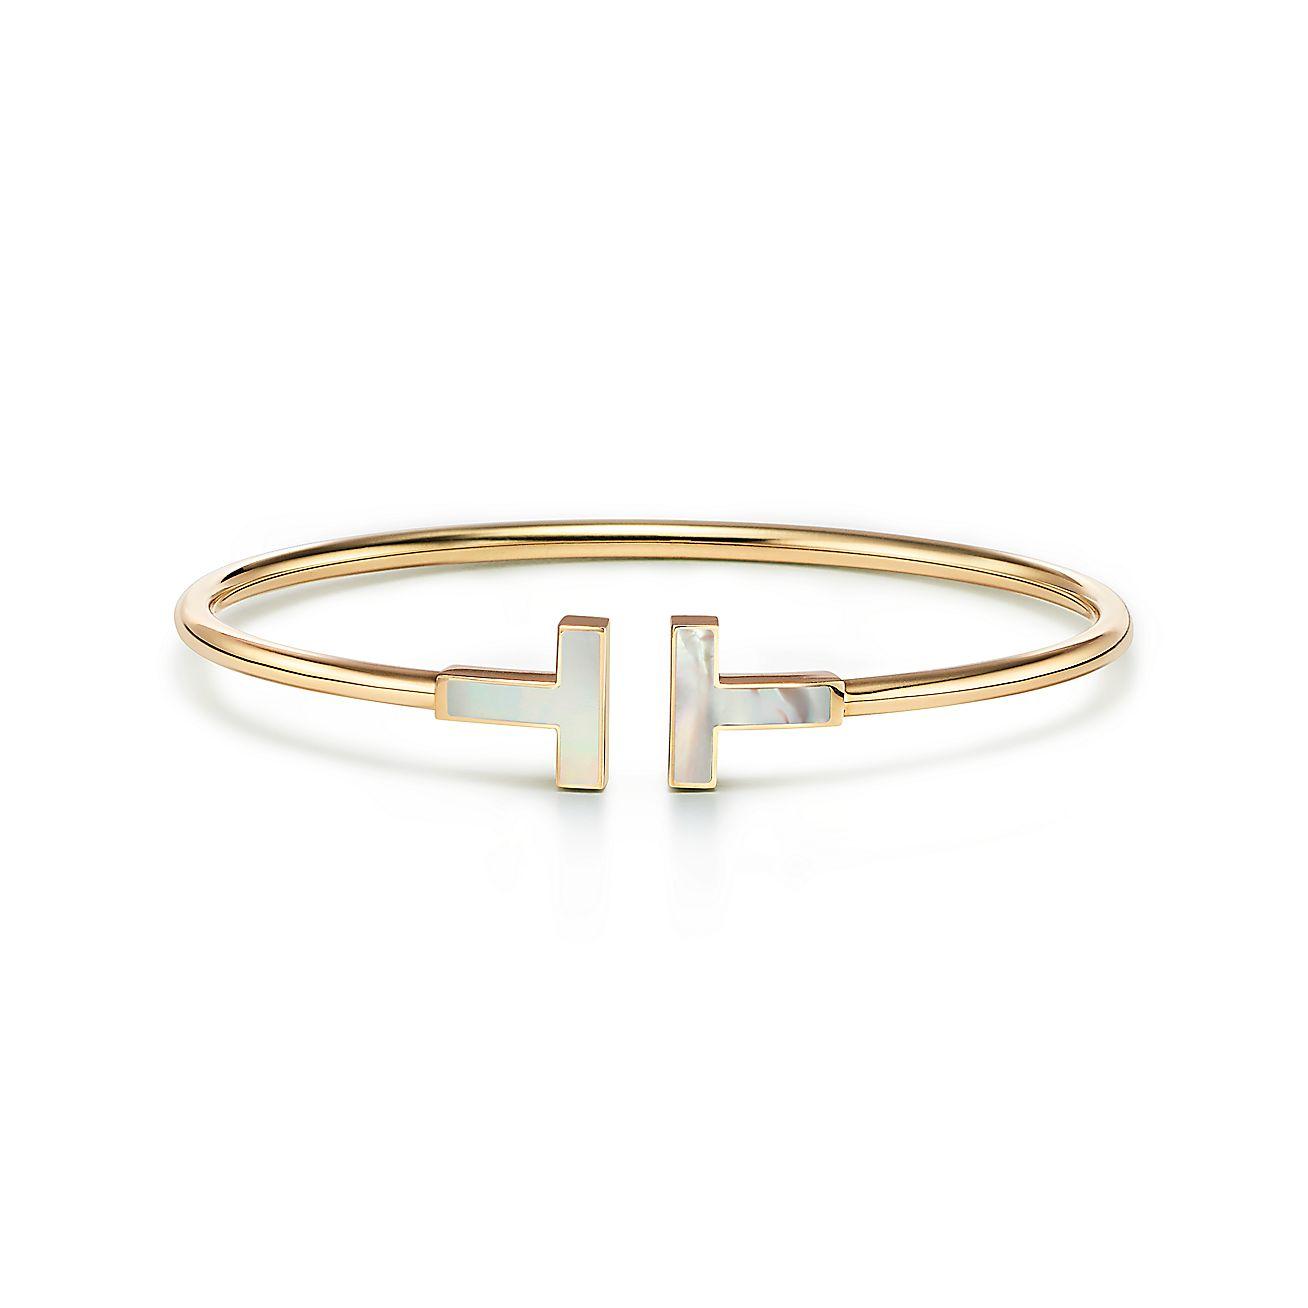 Tiffany T Mother Of Pearl Wire Bracelet In 18k Gold Medium Tiffany Co